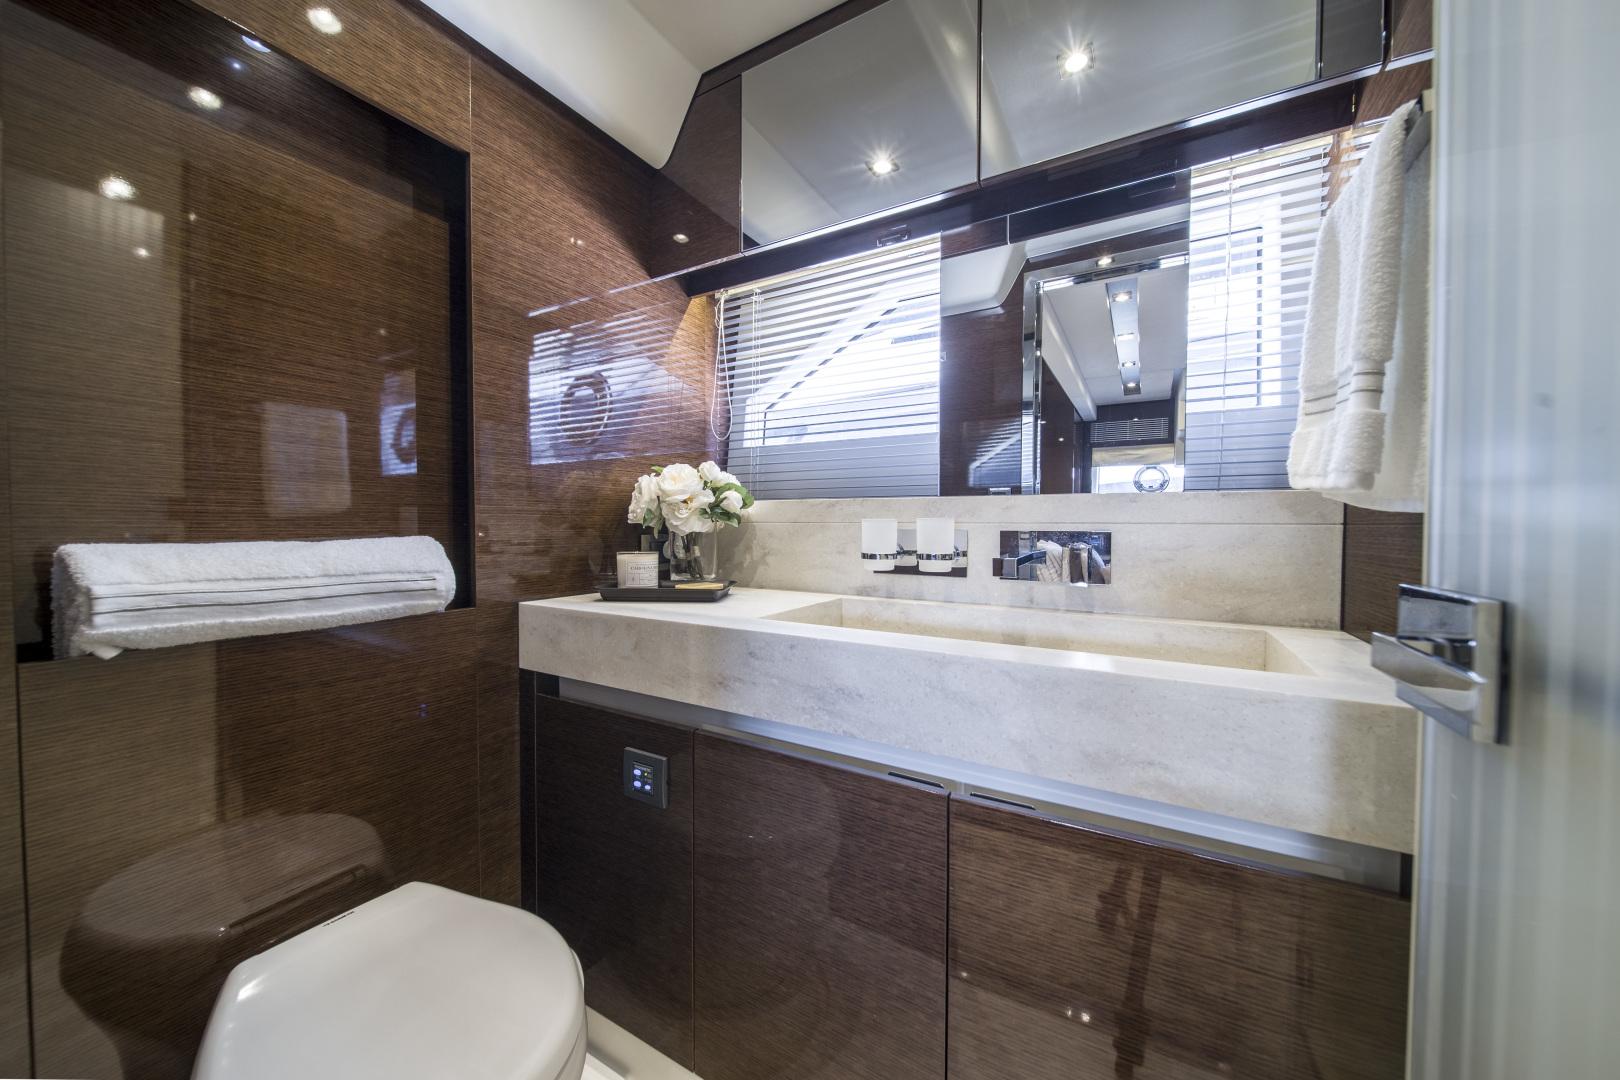 Prestige-680 Flybridge 2018-Seduction Sarasota-Florida-United States-2018 68 Prestige 680 Flybridge  VIP Stateroom Head-1498937 | Thumbnail